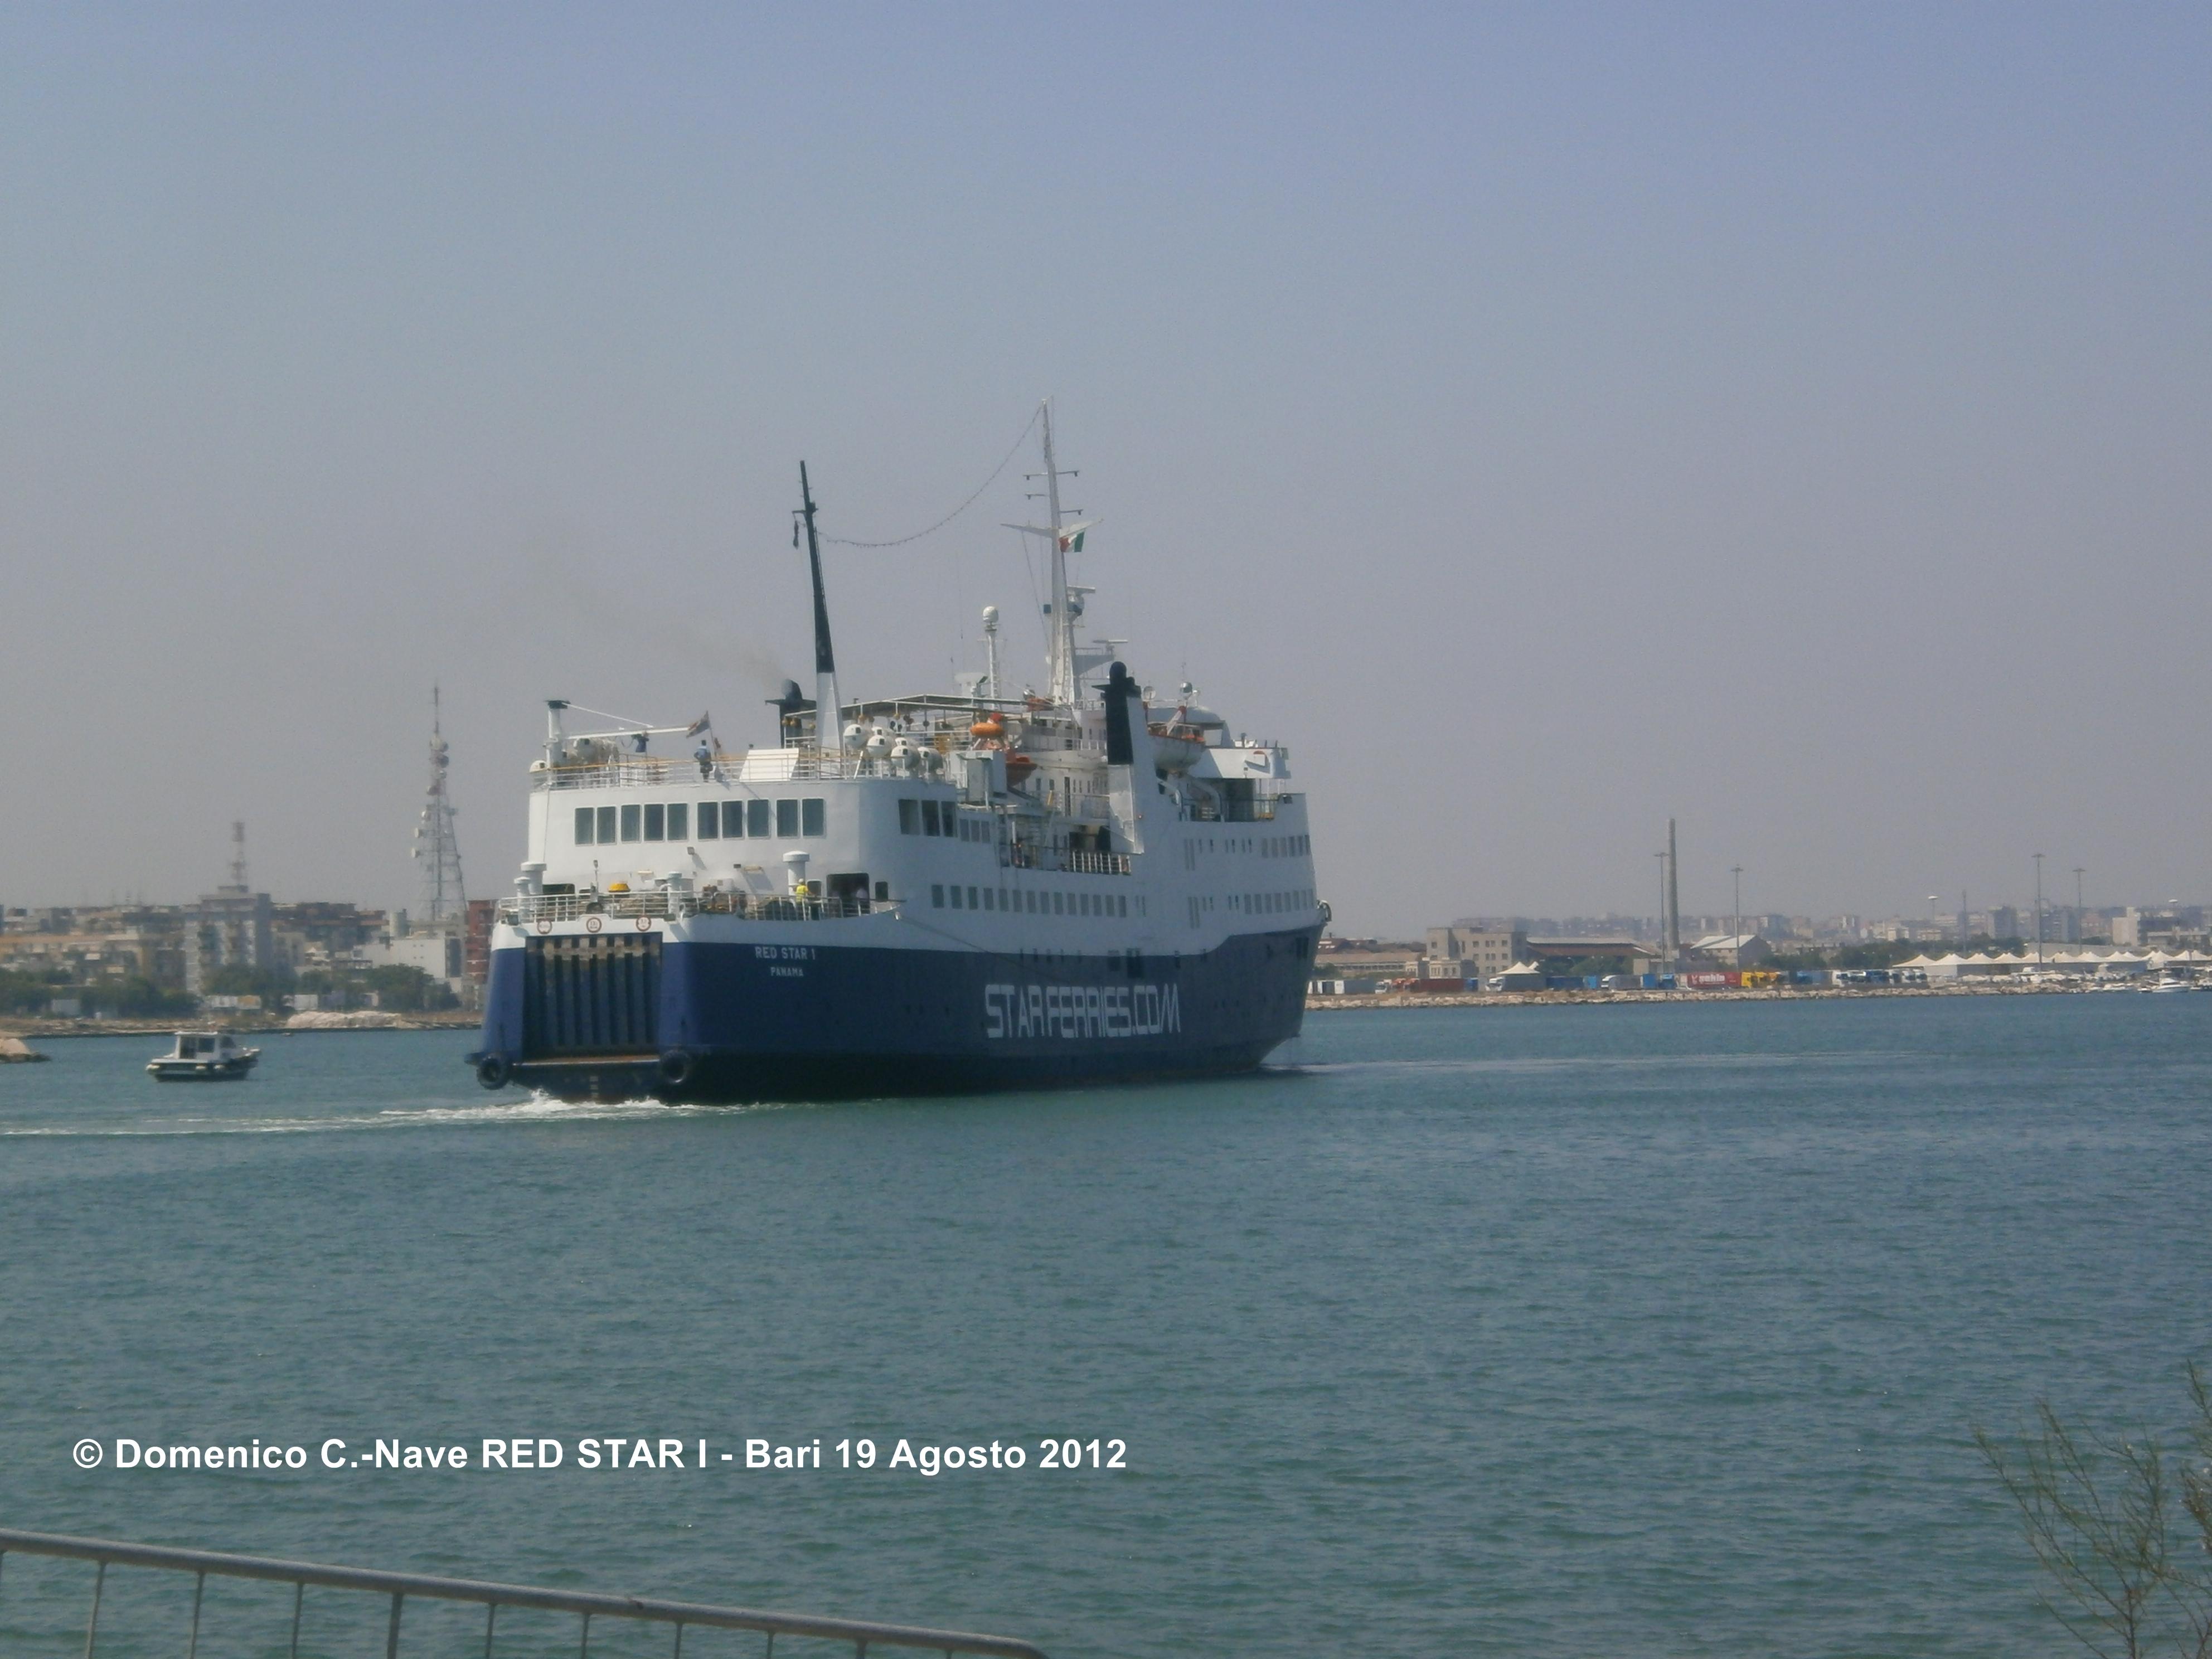 albaniaferries.it - Albania Ferries